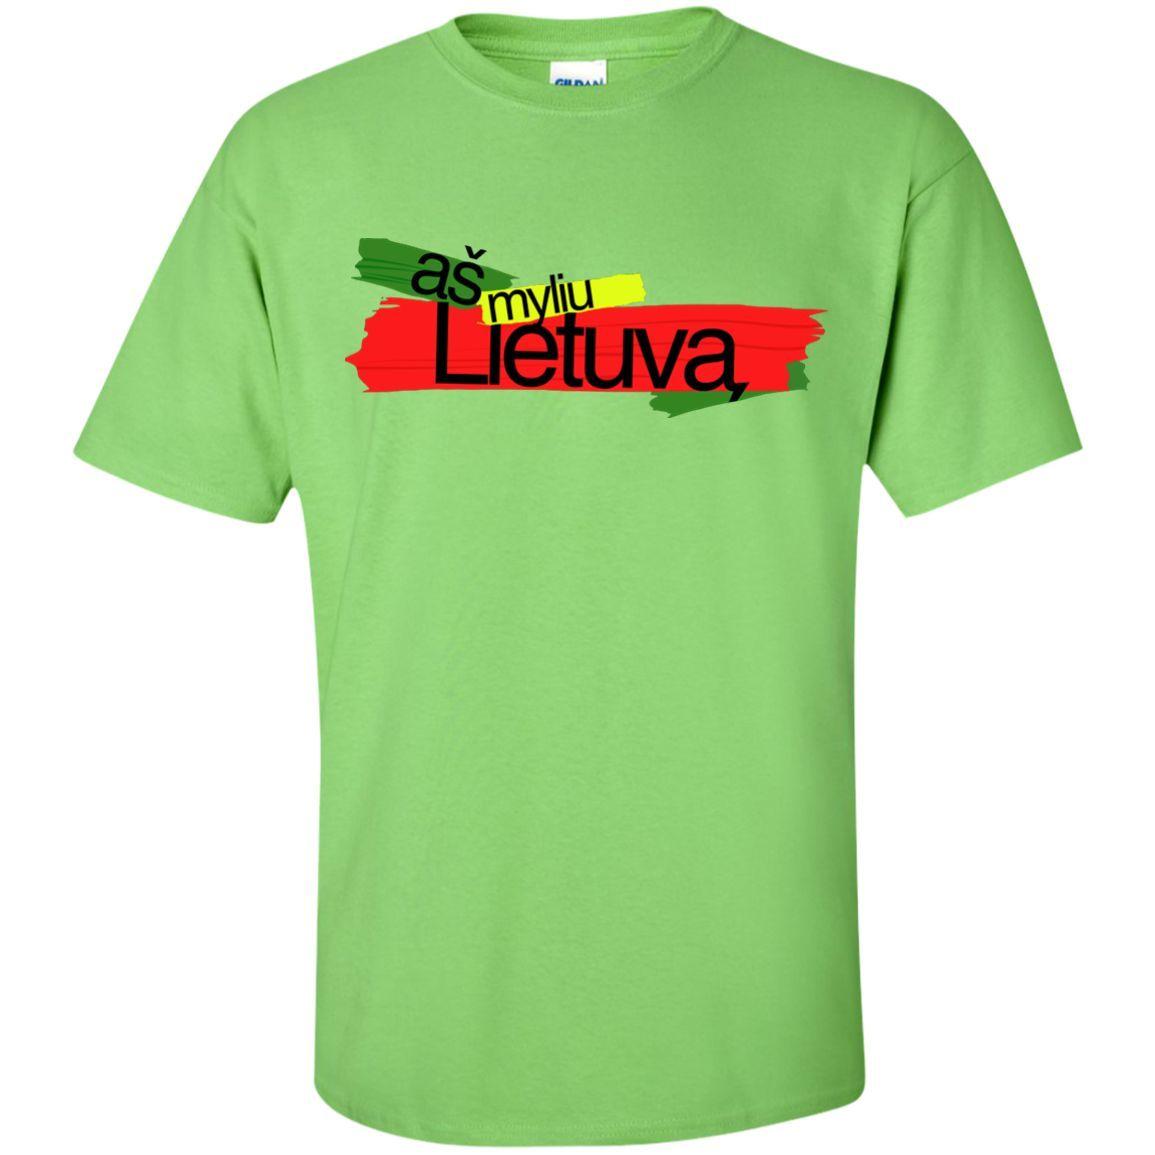 As Myliu Lietuva -- Youth Boys/Girls T-Shirt